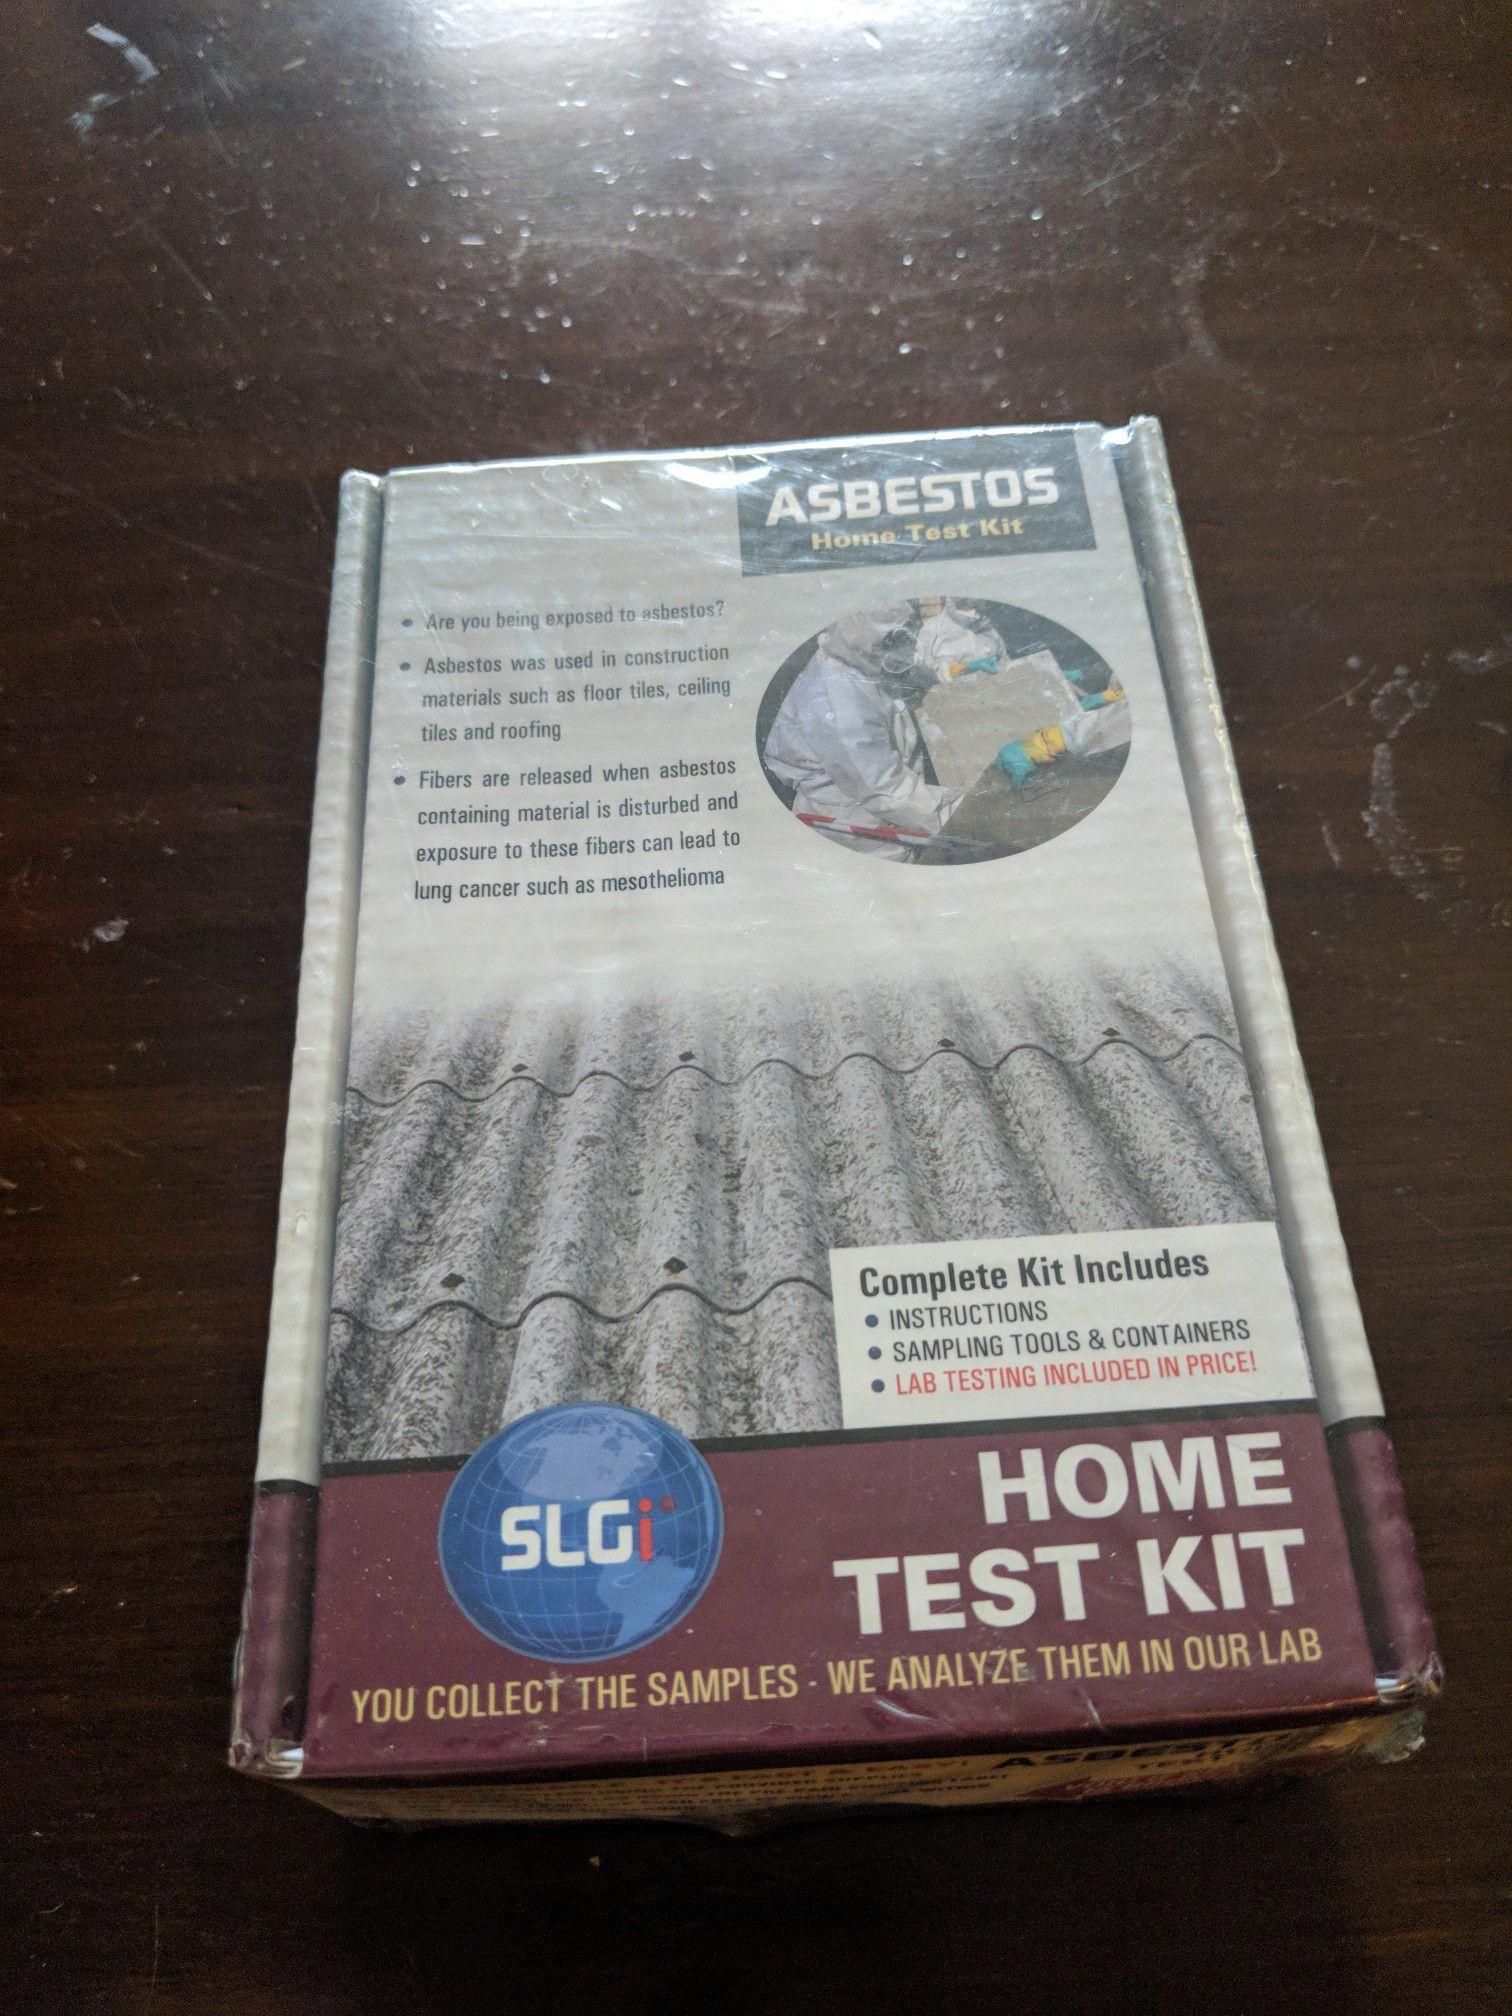 Asbestos Home Test Kit